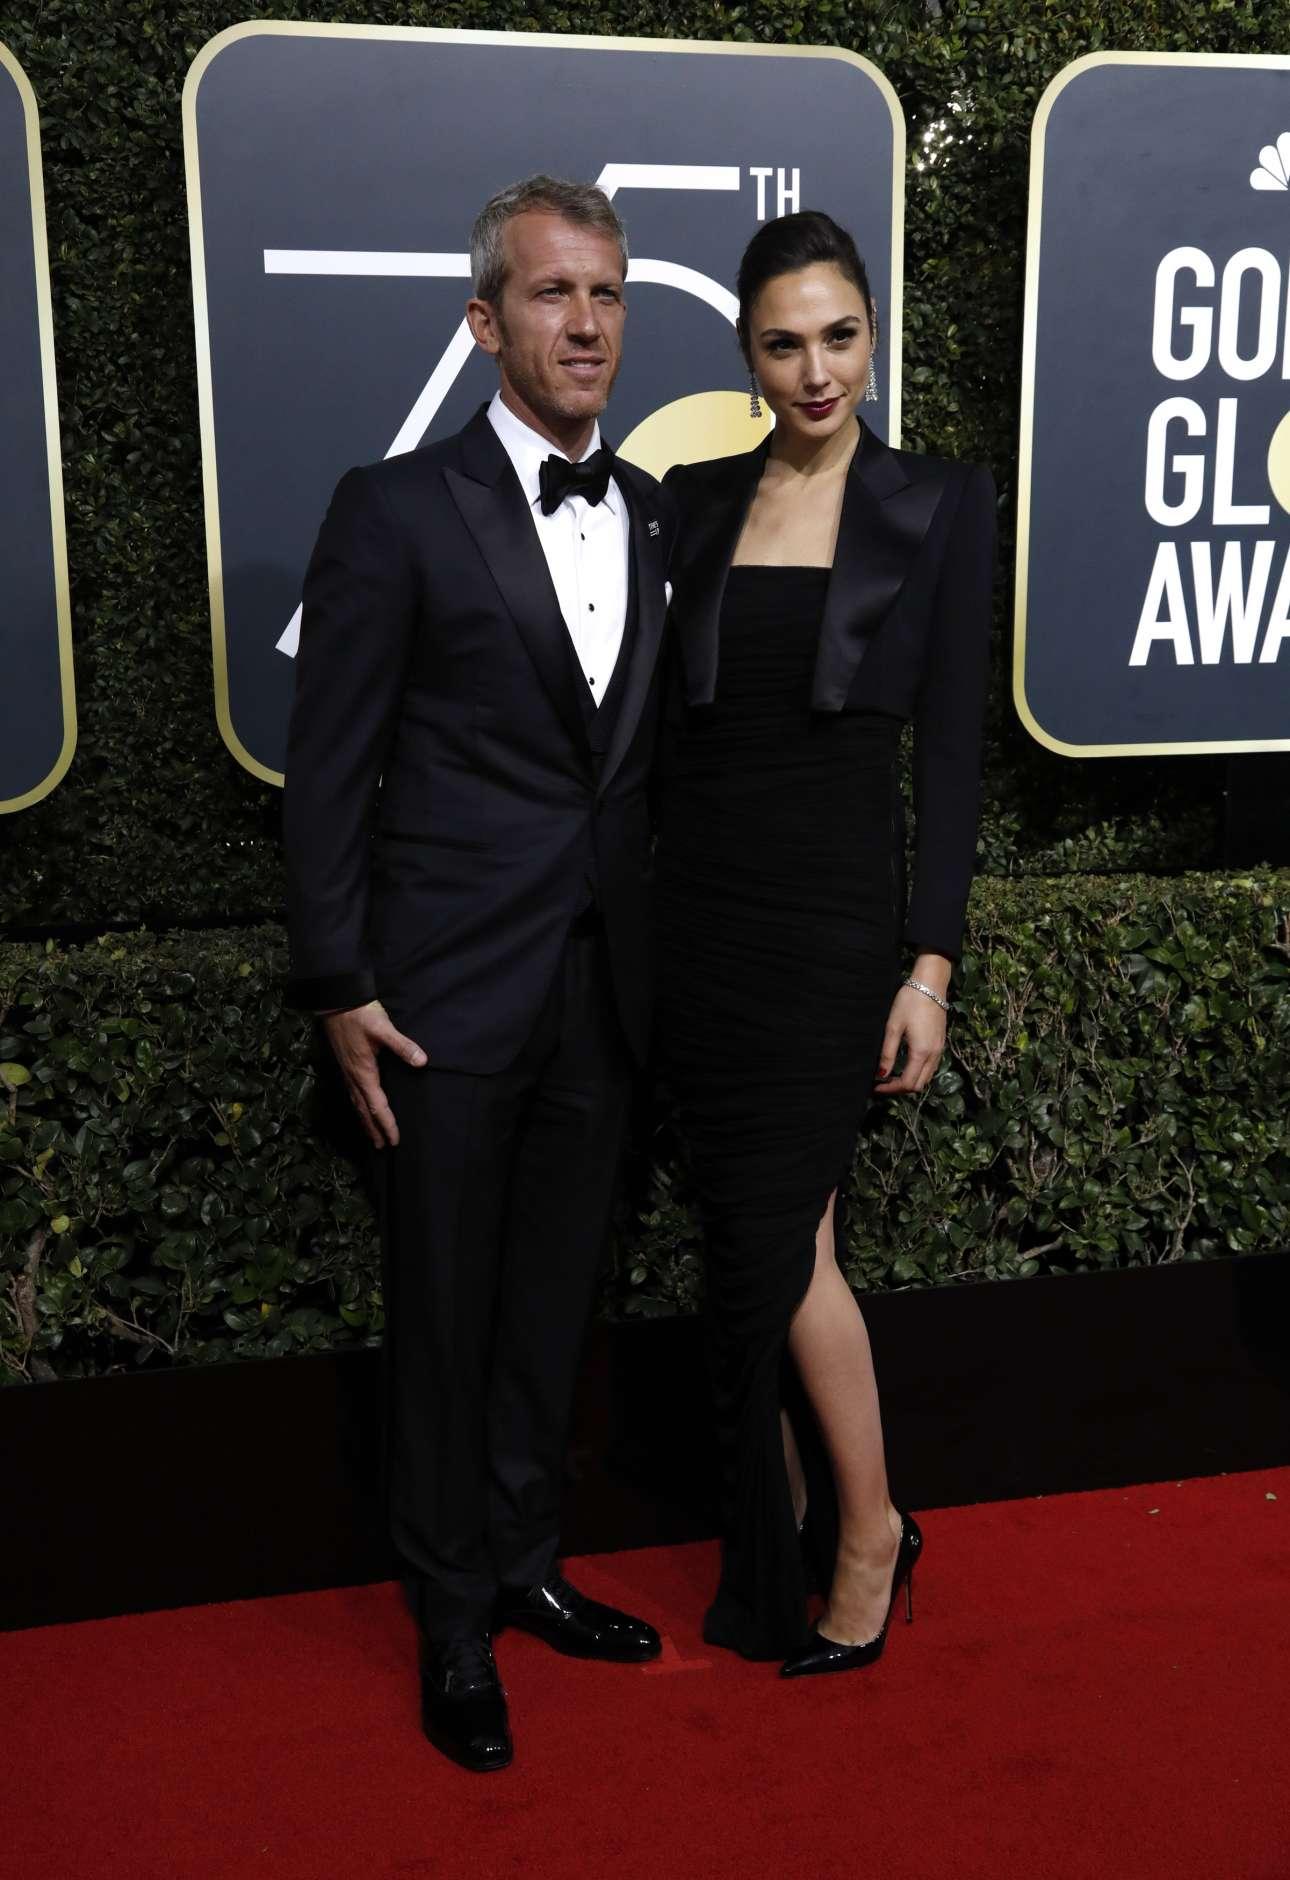 H ισραηλινή ηθοποιός Γκαλ Γκαντόντ, η πιο «επικερδής» στο Χόλιγουντ, καταφθάνει στην τελετή, με τον σύζυγό της Γιάρον Βερσάνο